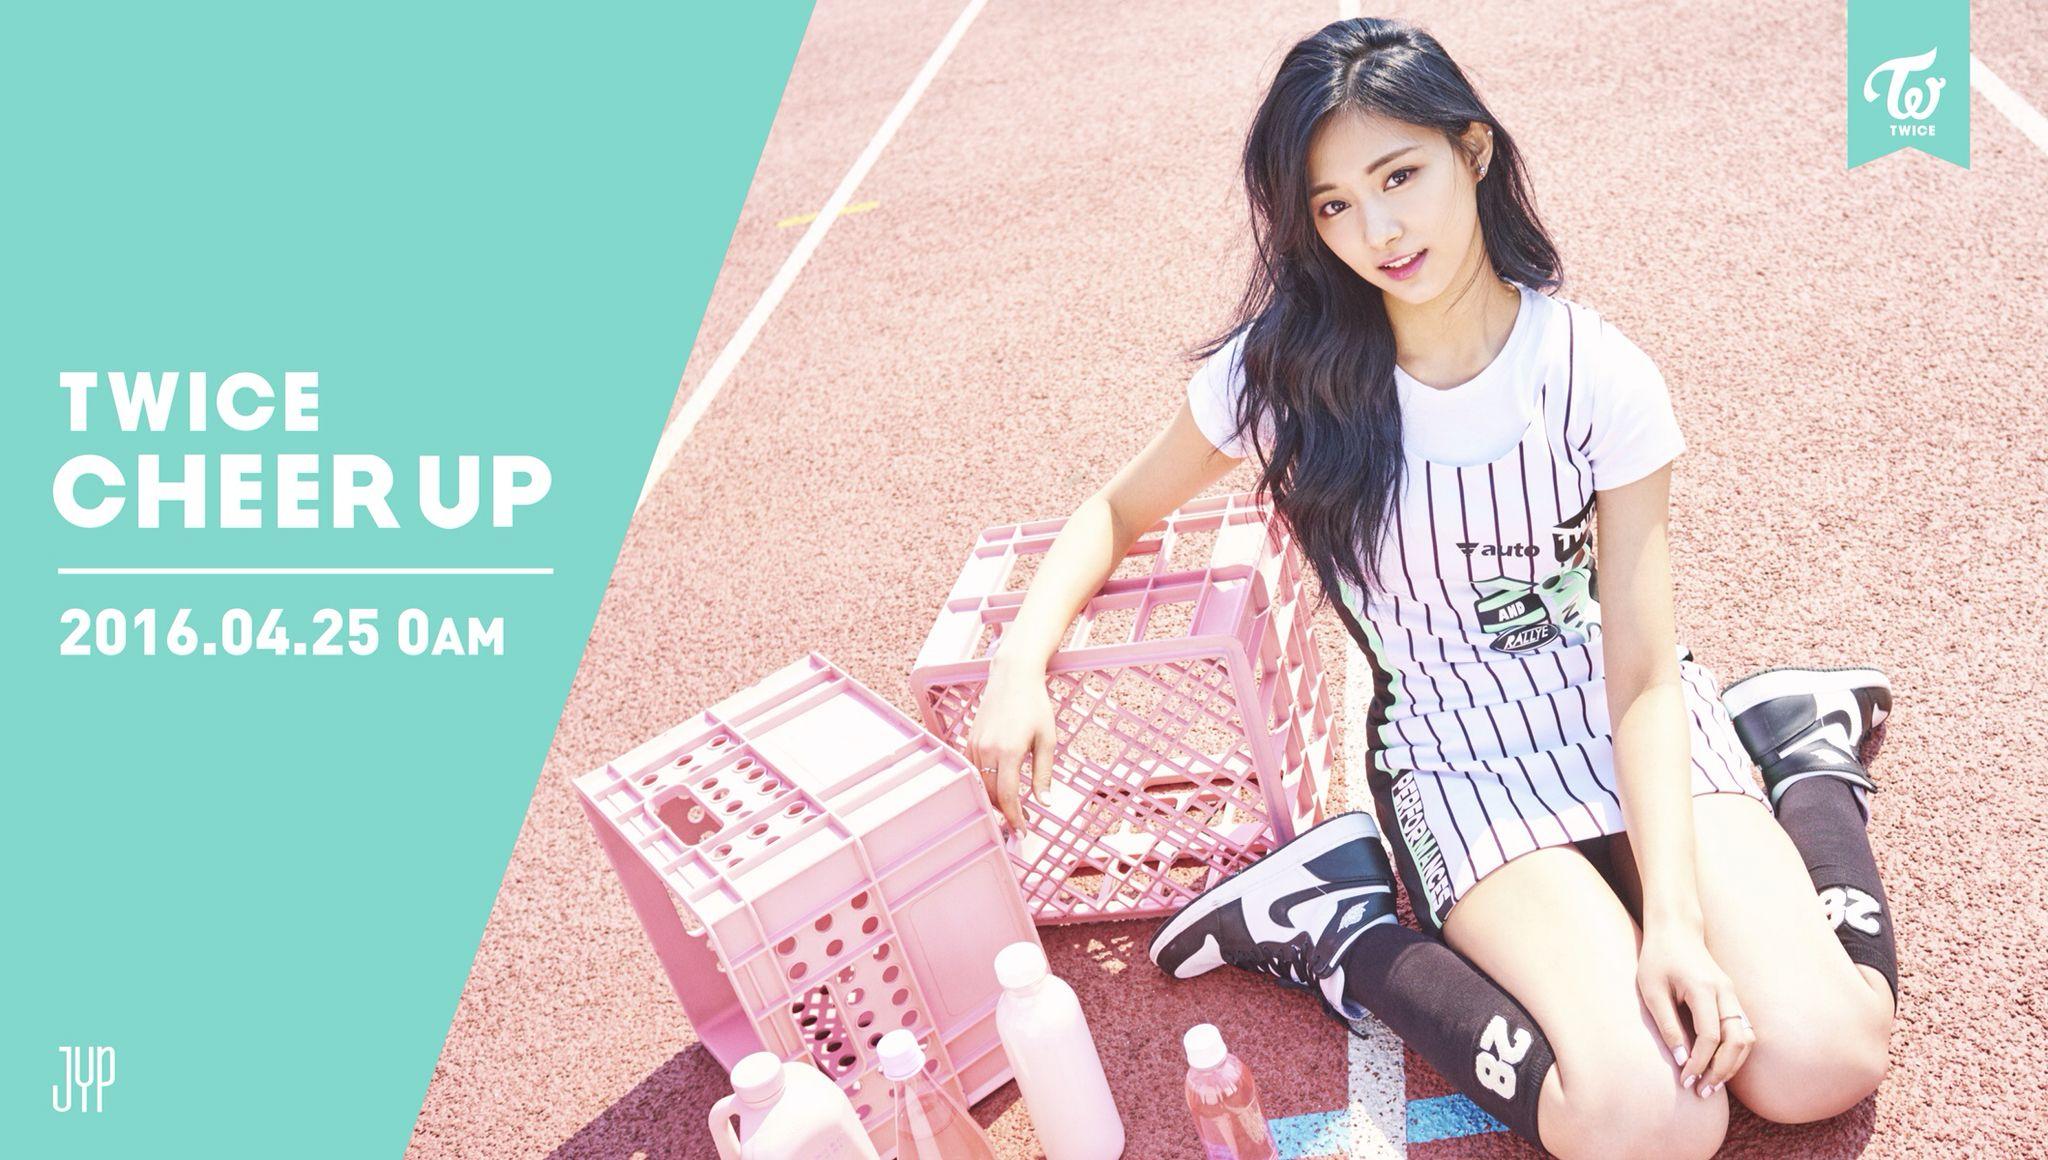 Twice Tzuyu Cheer Up Twicye 트와이스 Pinterest Cheer Kpop